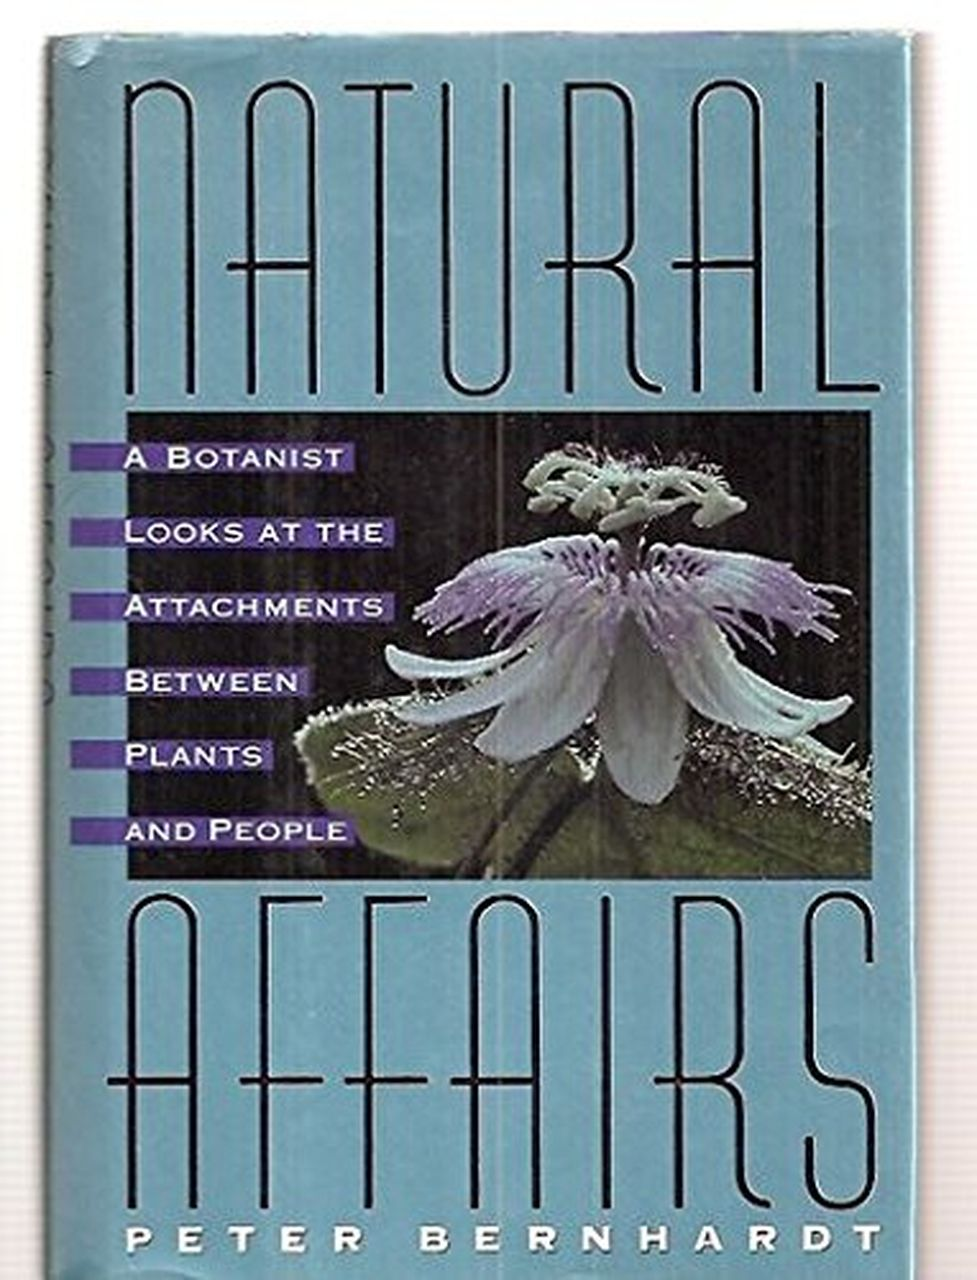 Natural Affairs by Peter Bernhardt